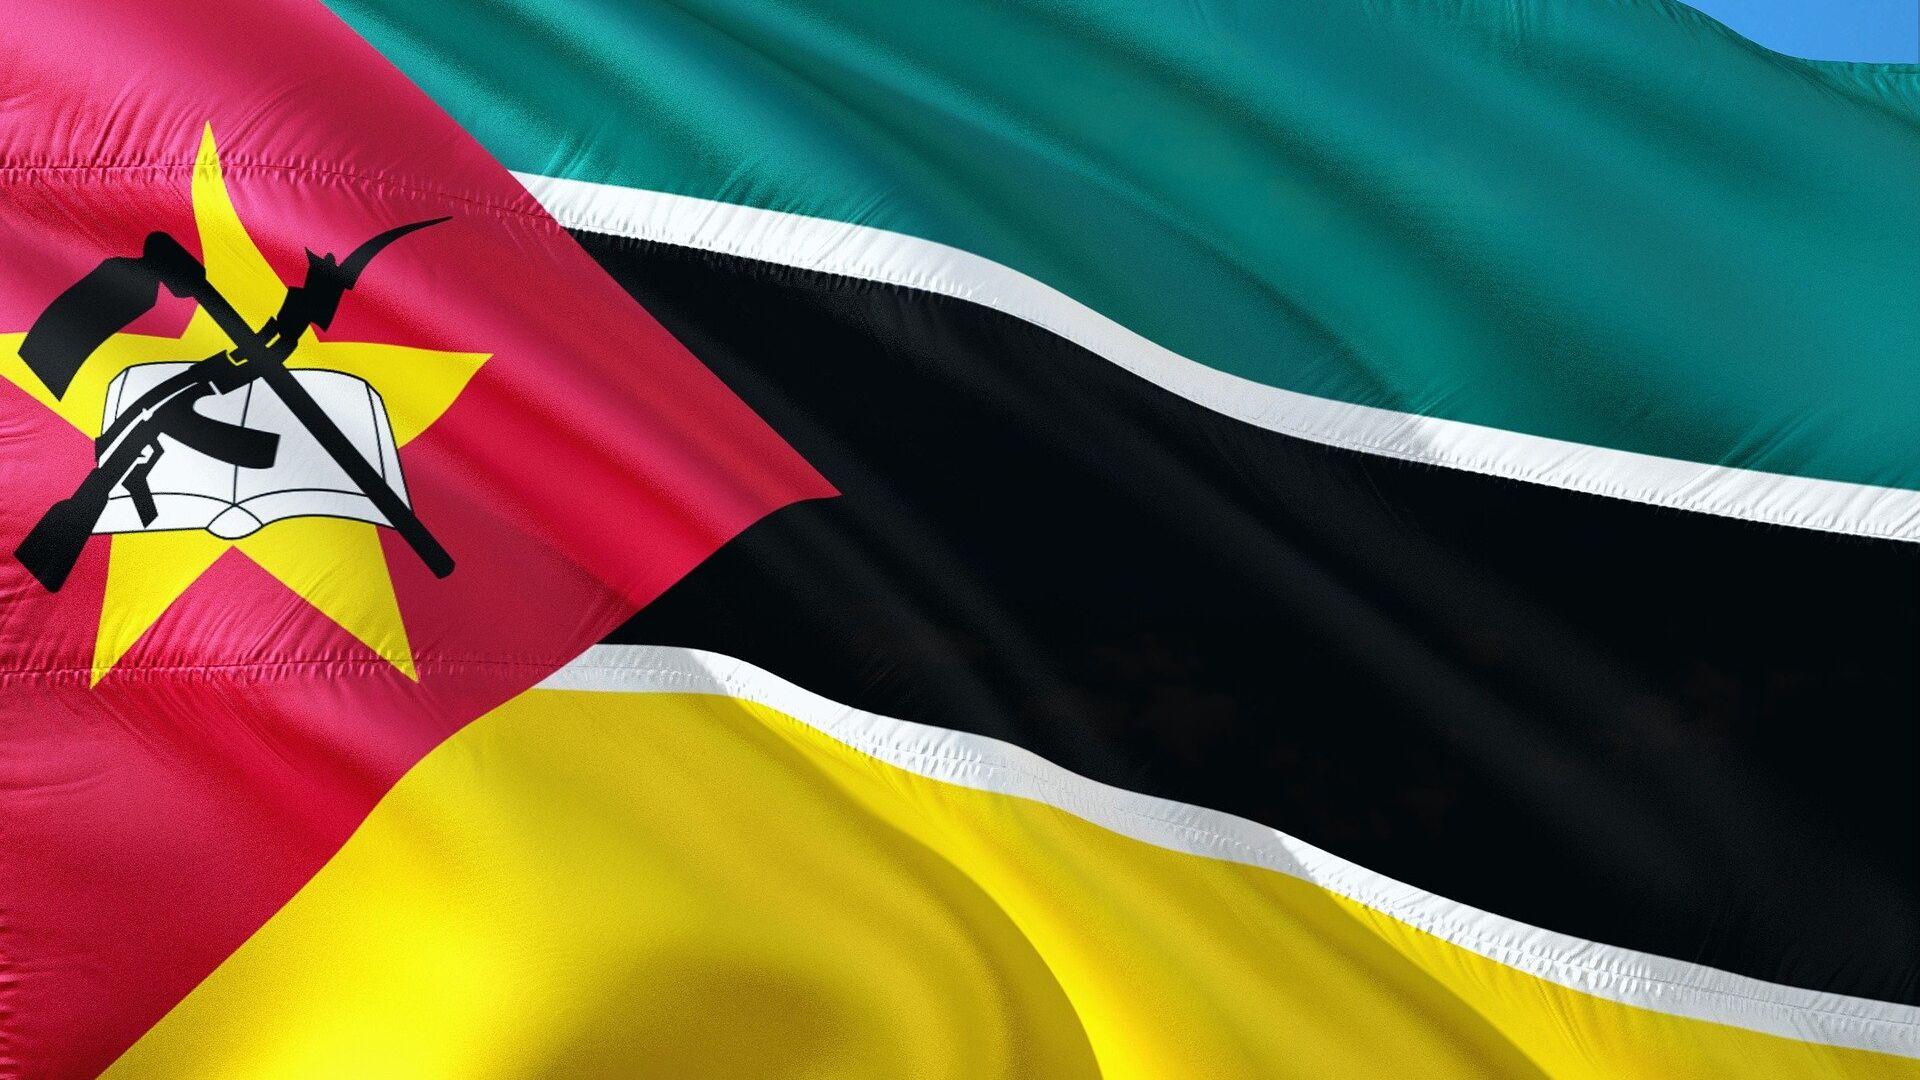 La bandera de Mozambique - Sputnik Mundo, 1920, 29.03.2021